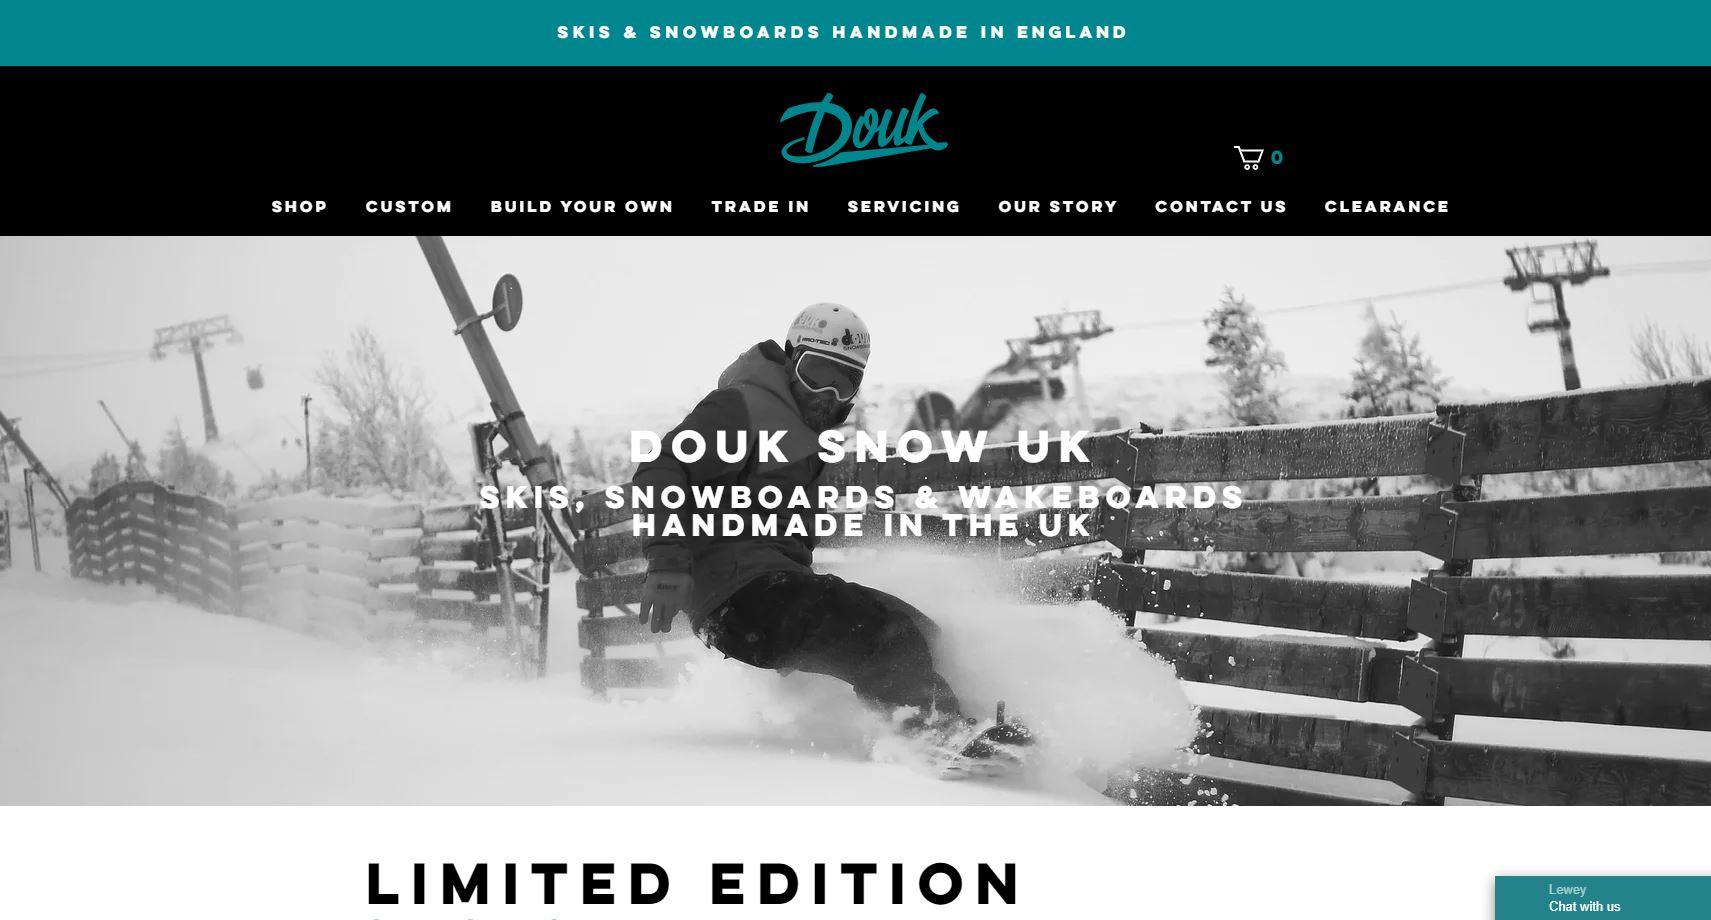 douk snow